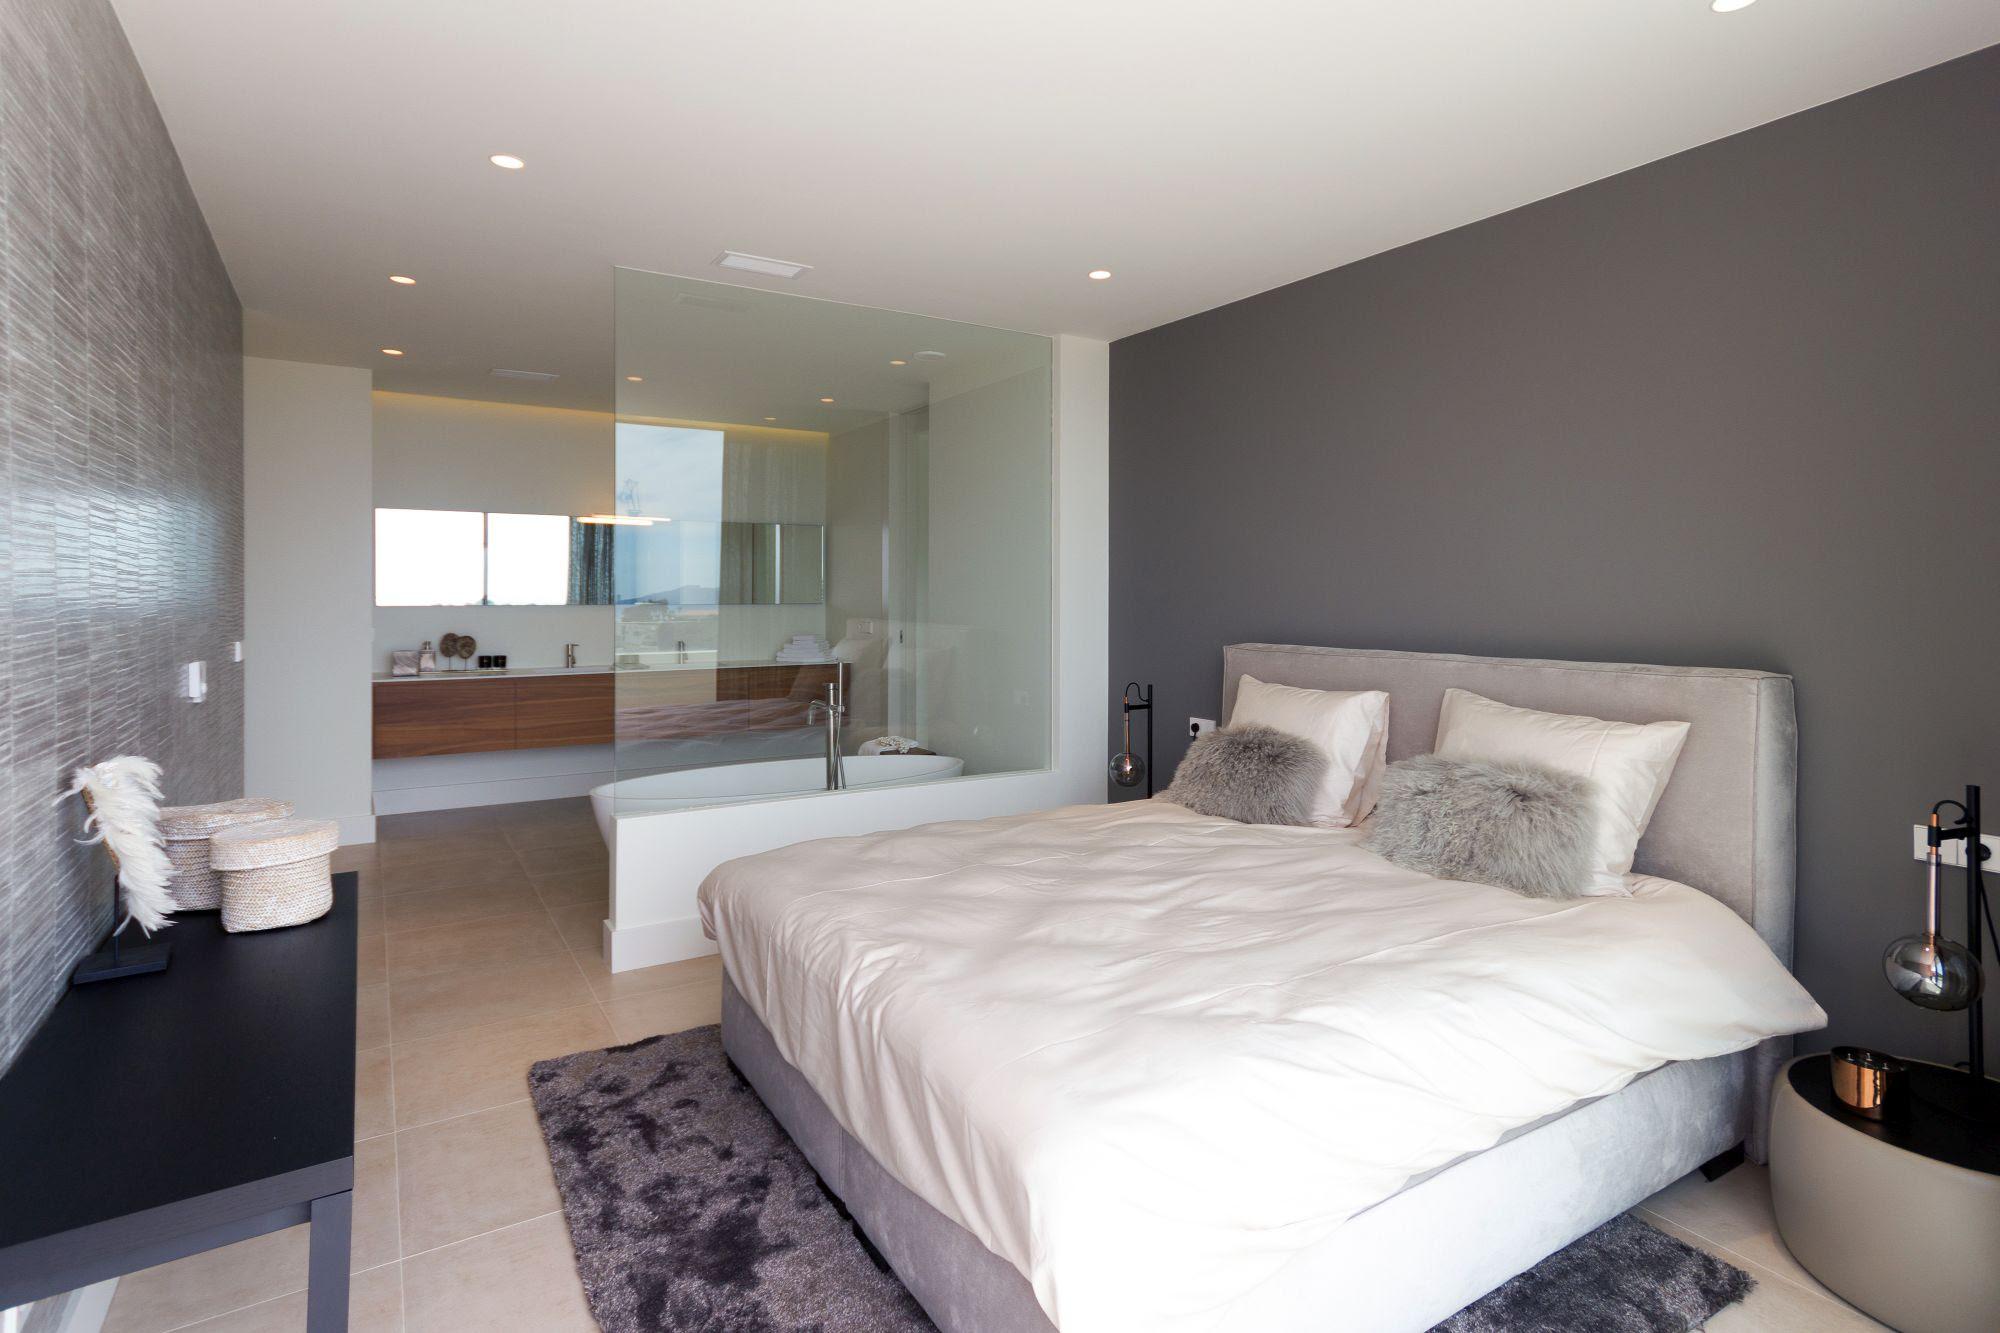 4 bedroom villa For Sale in Altea - photograph 5